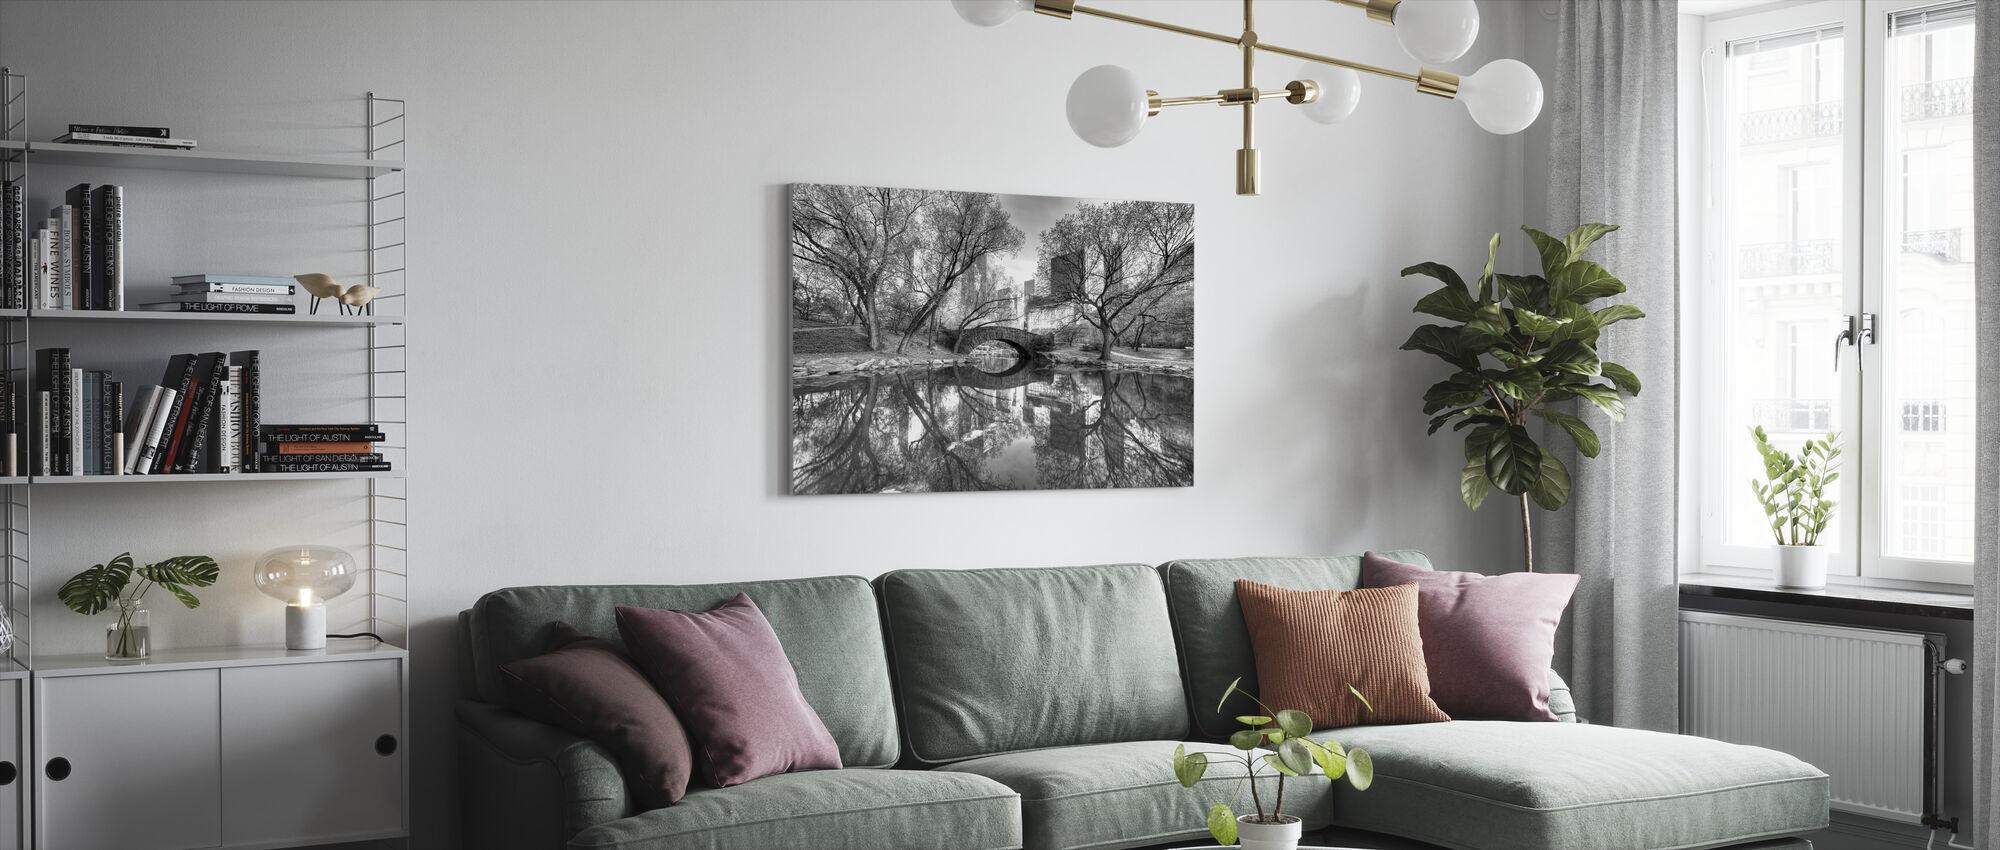 Bro i Central Park - Canvastavla - Vardagsrum